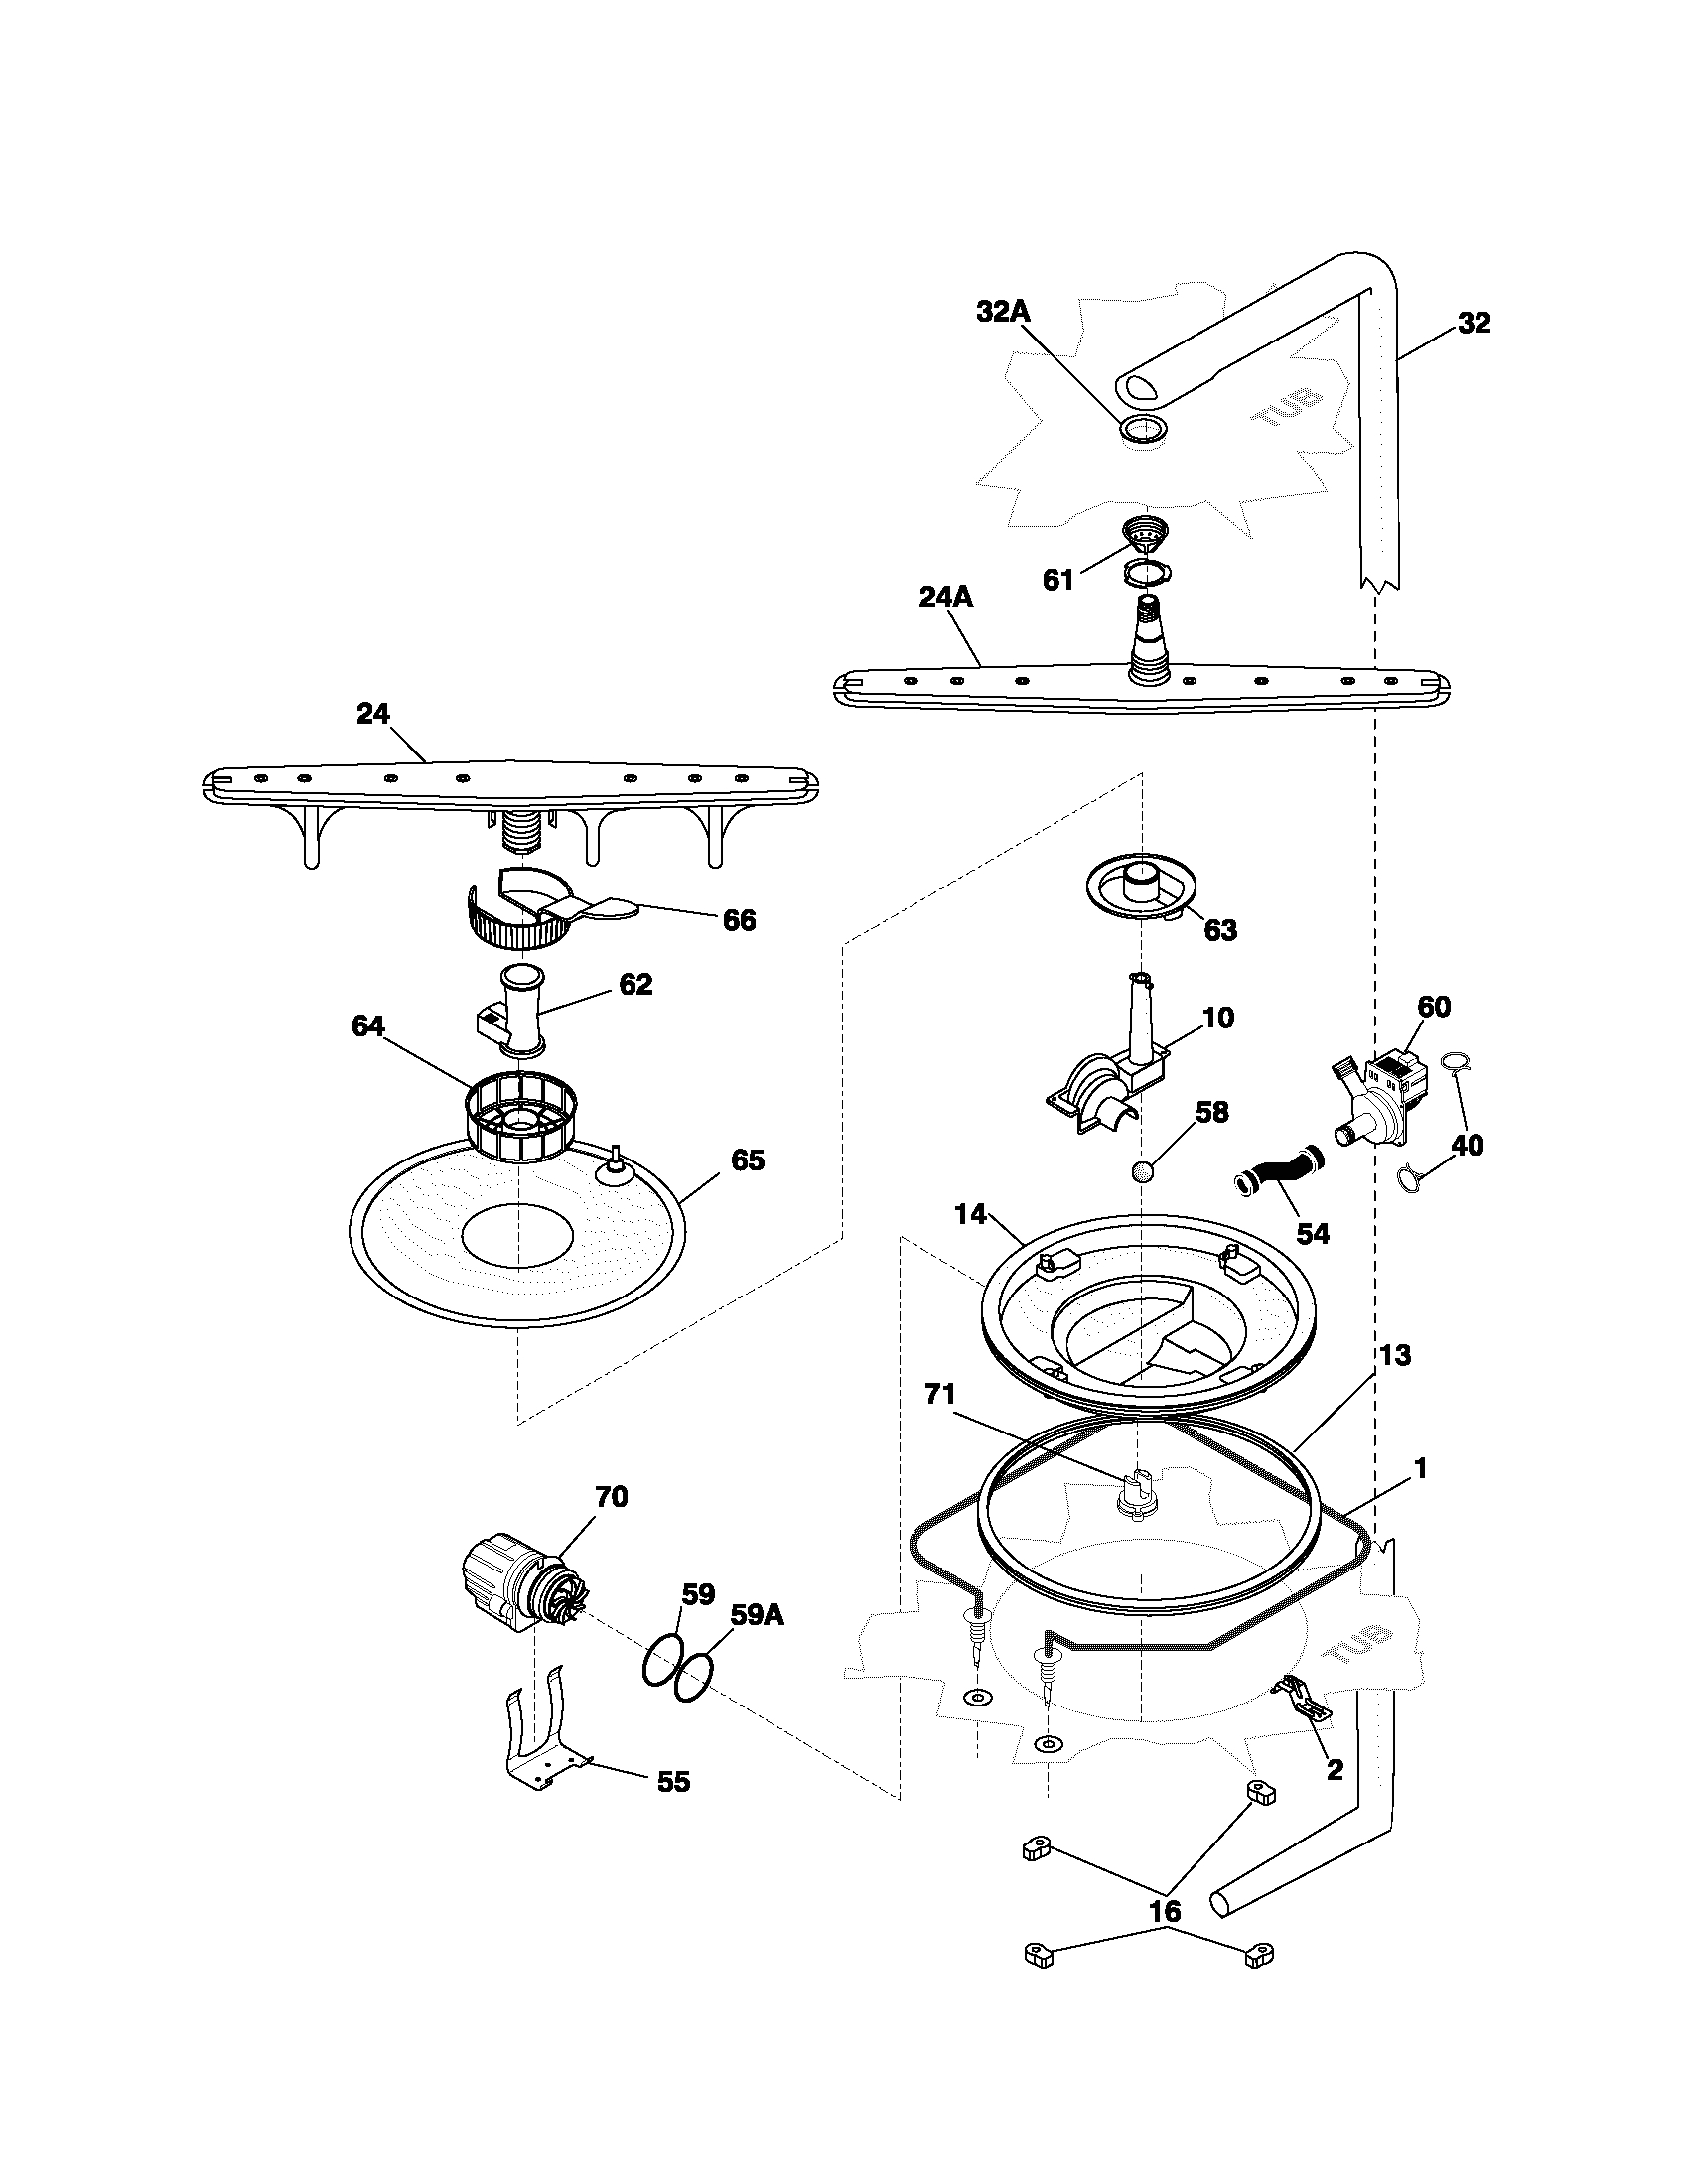 electrolux schematics frigidaire pldb999cc0 timer stove clocks and appliance timerspldb999cc0 dishwasher motor u0026 pump parts diagram